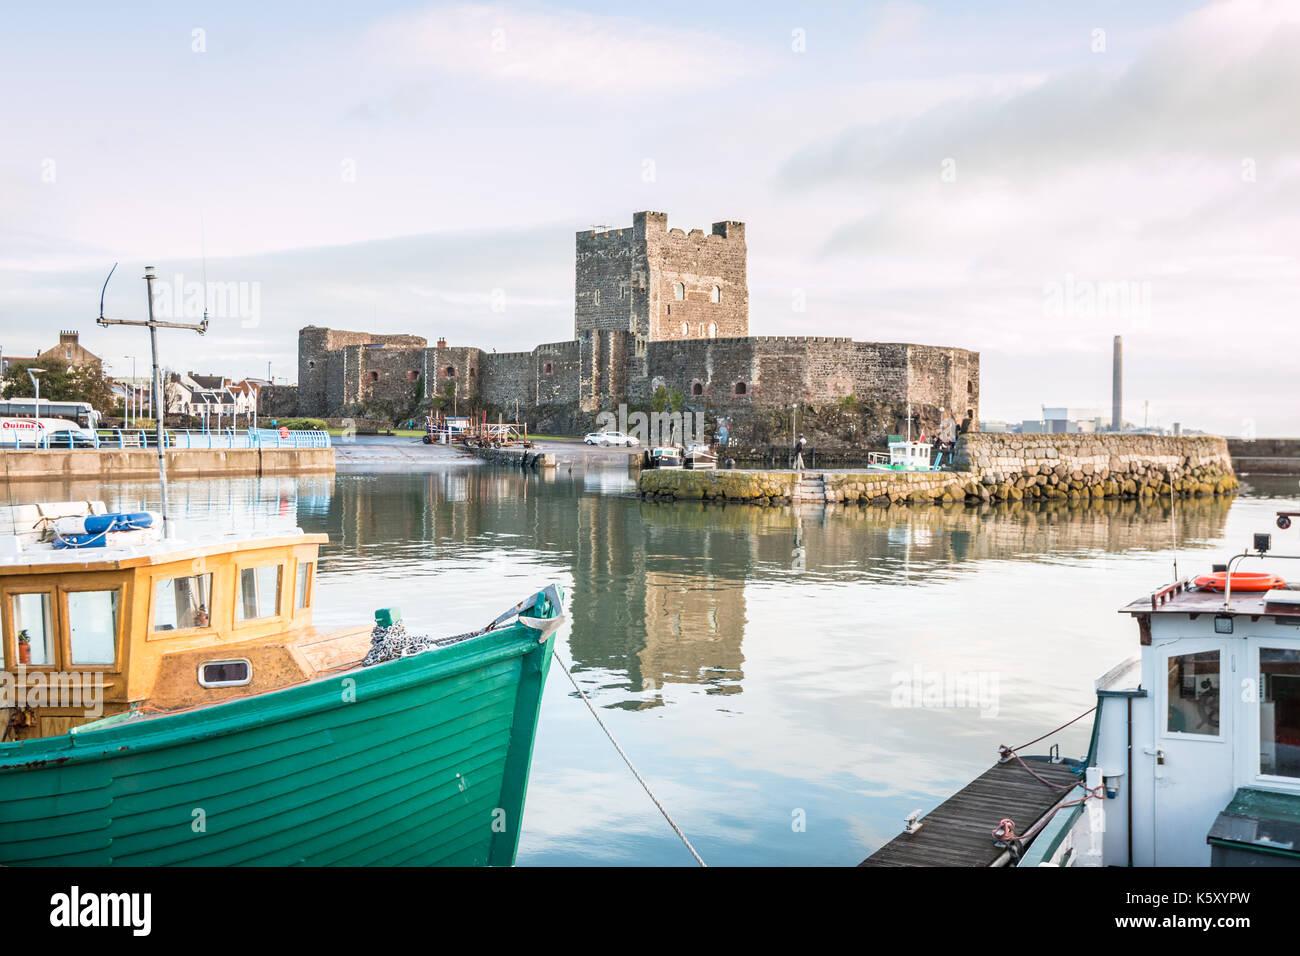 Carrickfergus castle in Northern Ireland - Stock Image